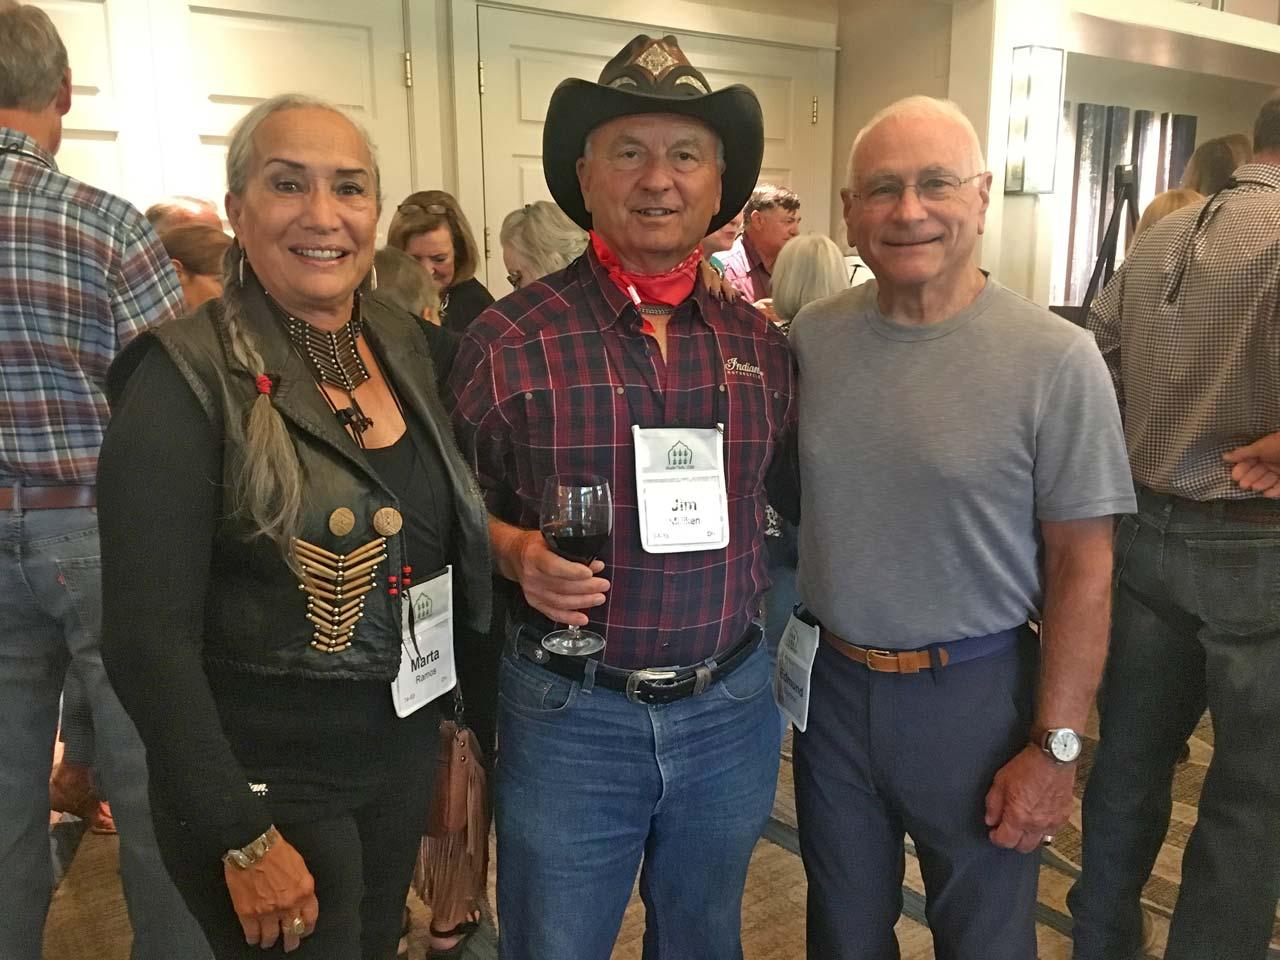 Marta Ramos and Jim Milliken with Edmund Dymicki